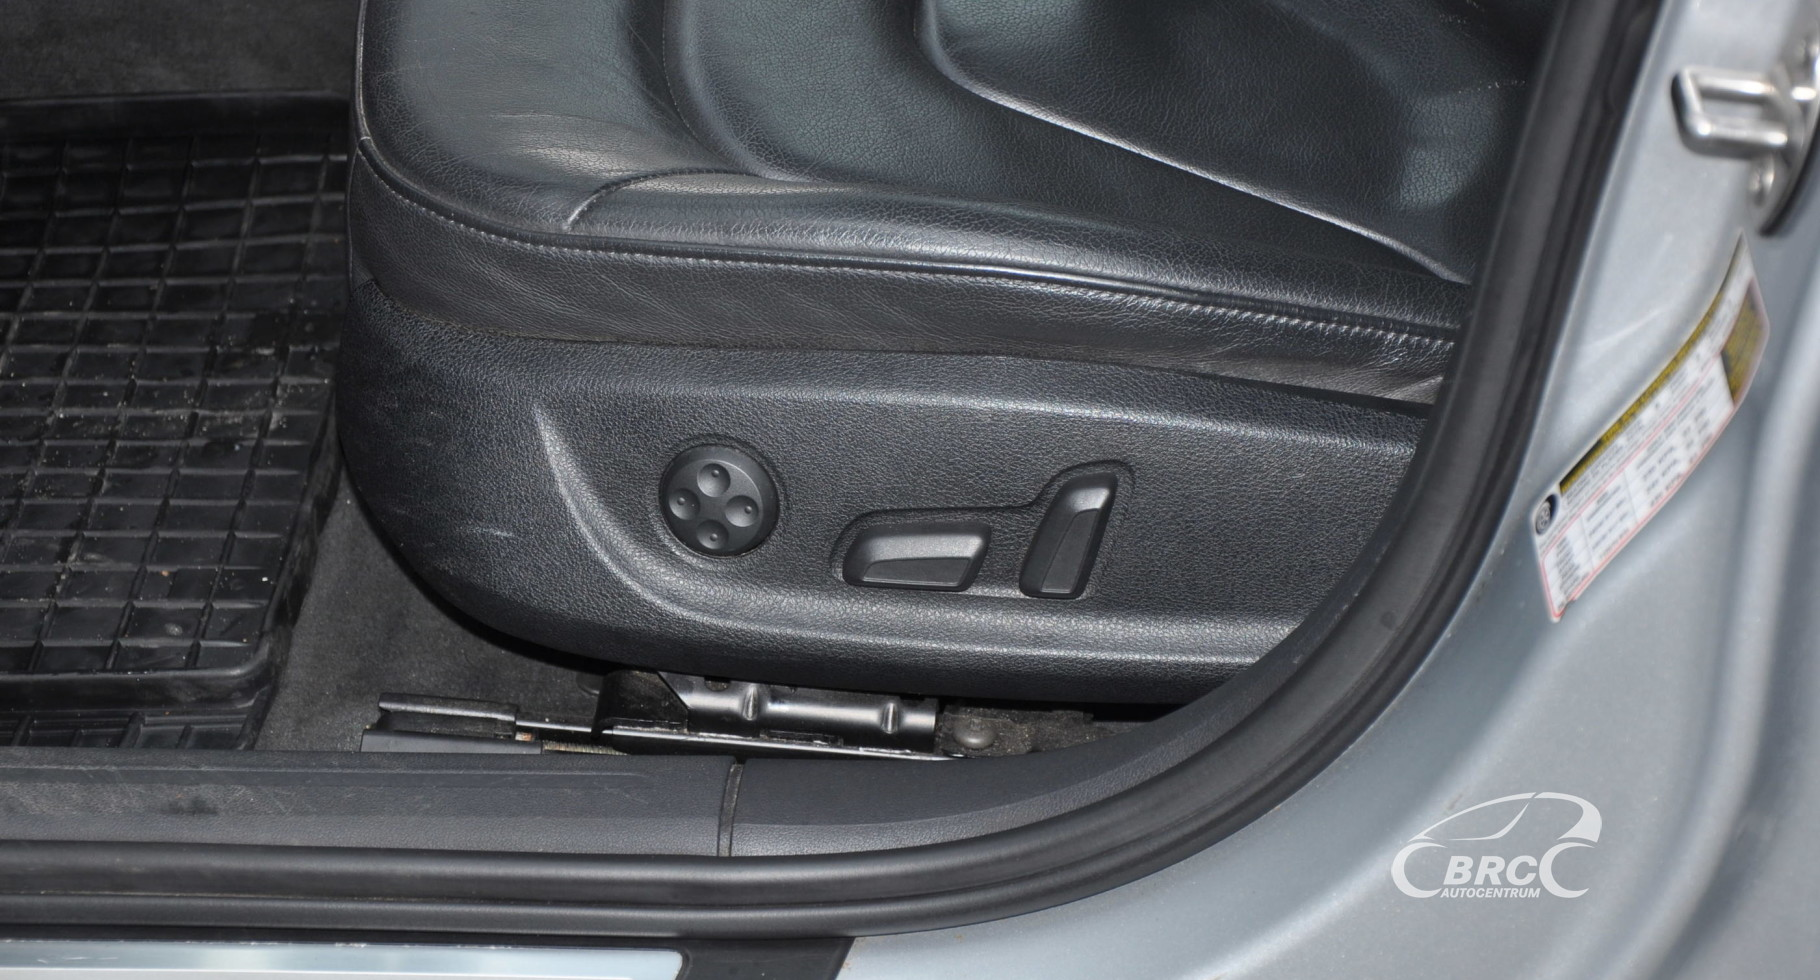 Audi A4 2.0 TFSI Automatas